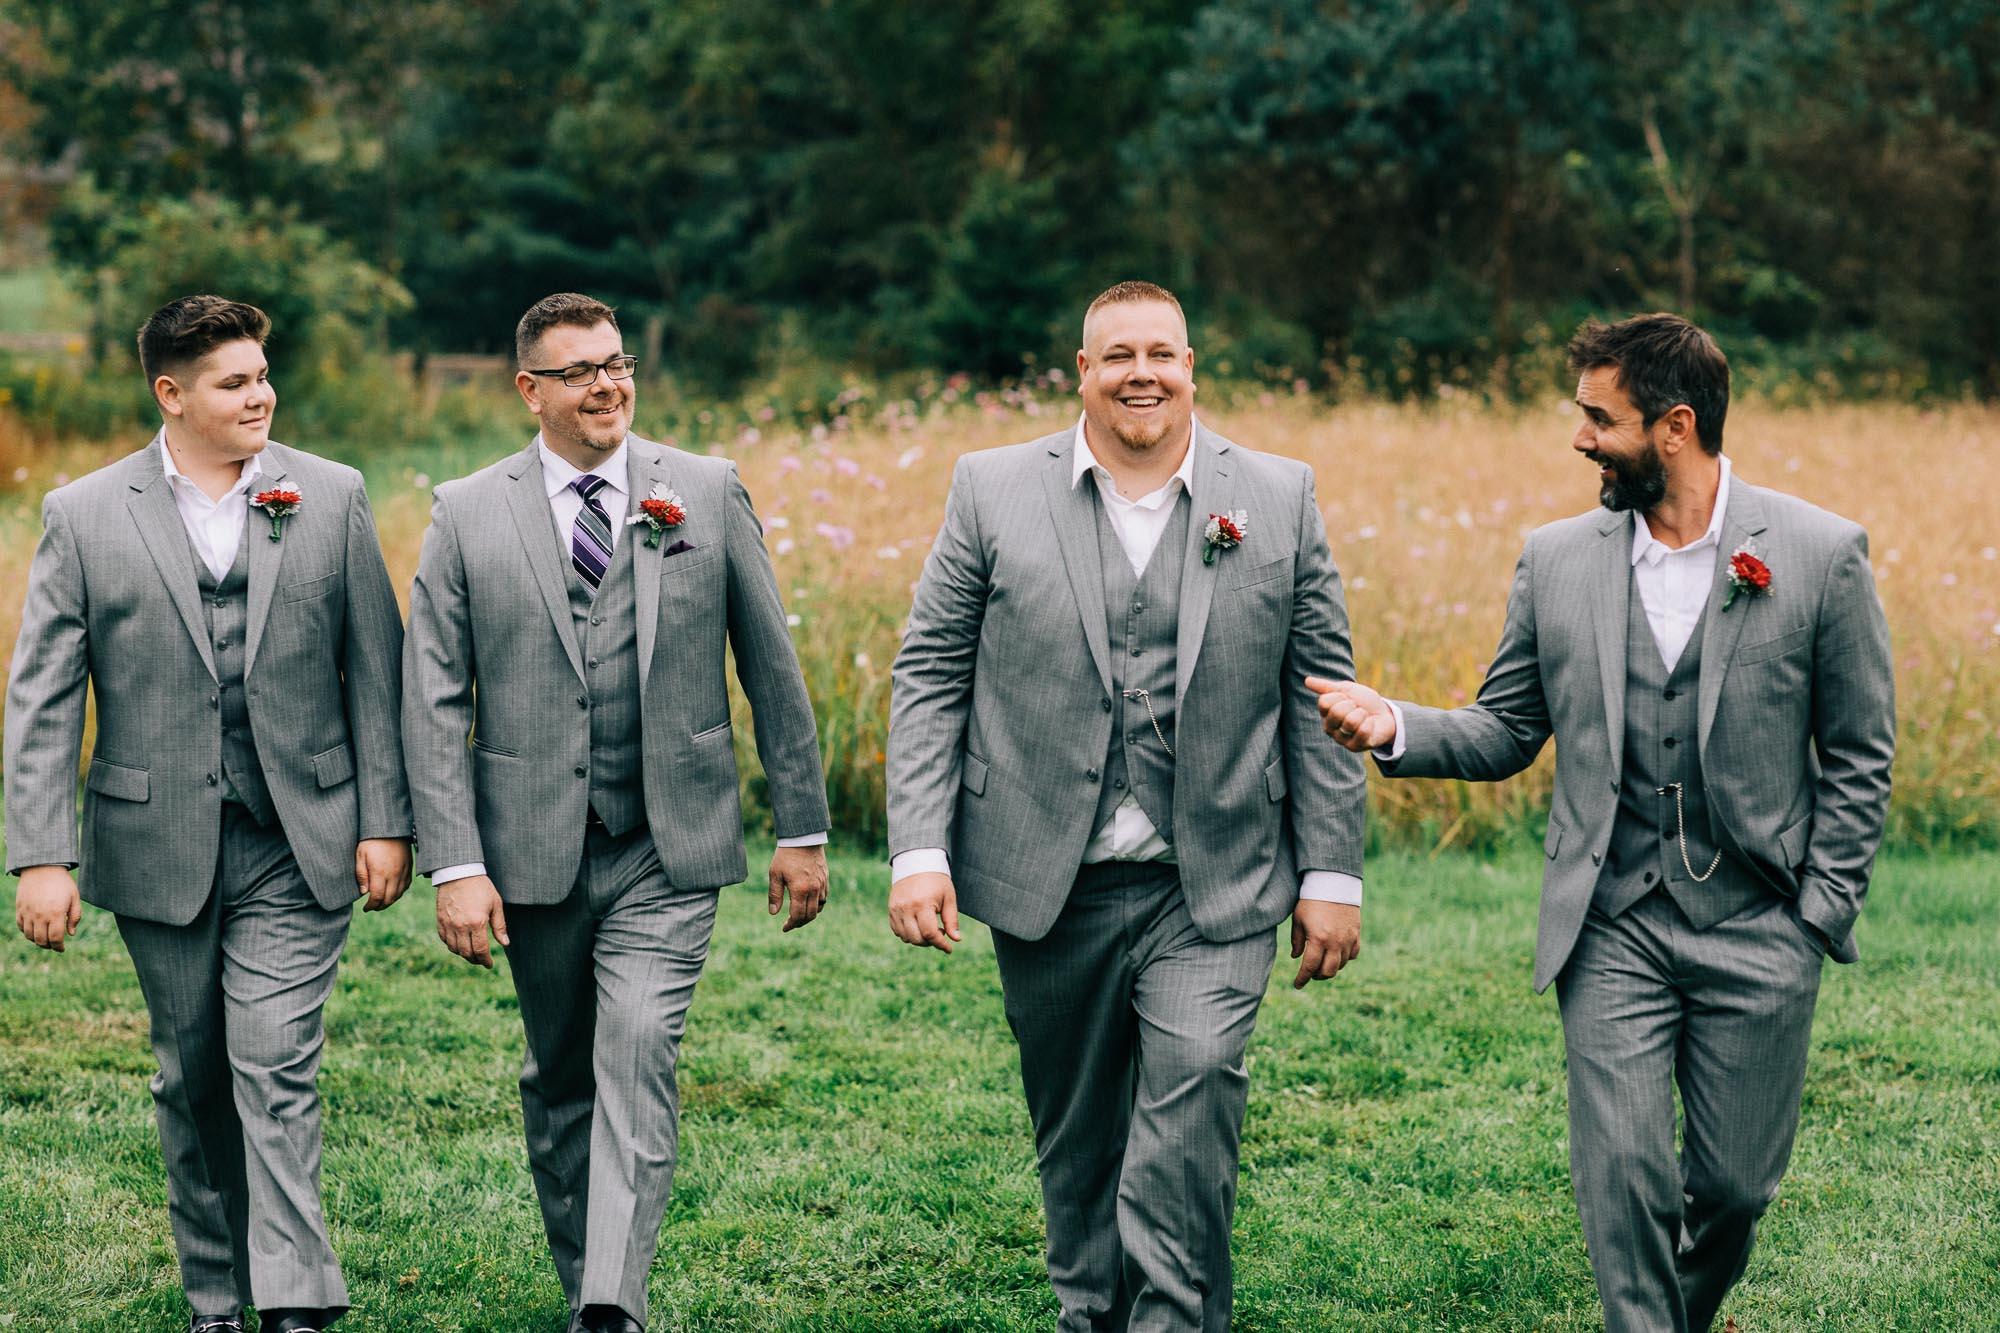 Lodge-at-Raven-Creek-October-wedding-46.jpg